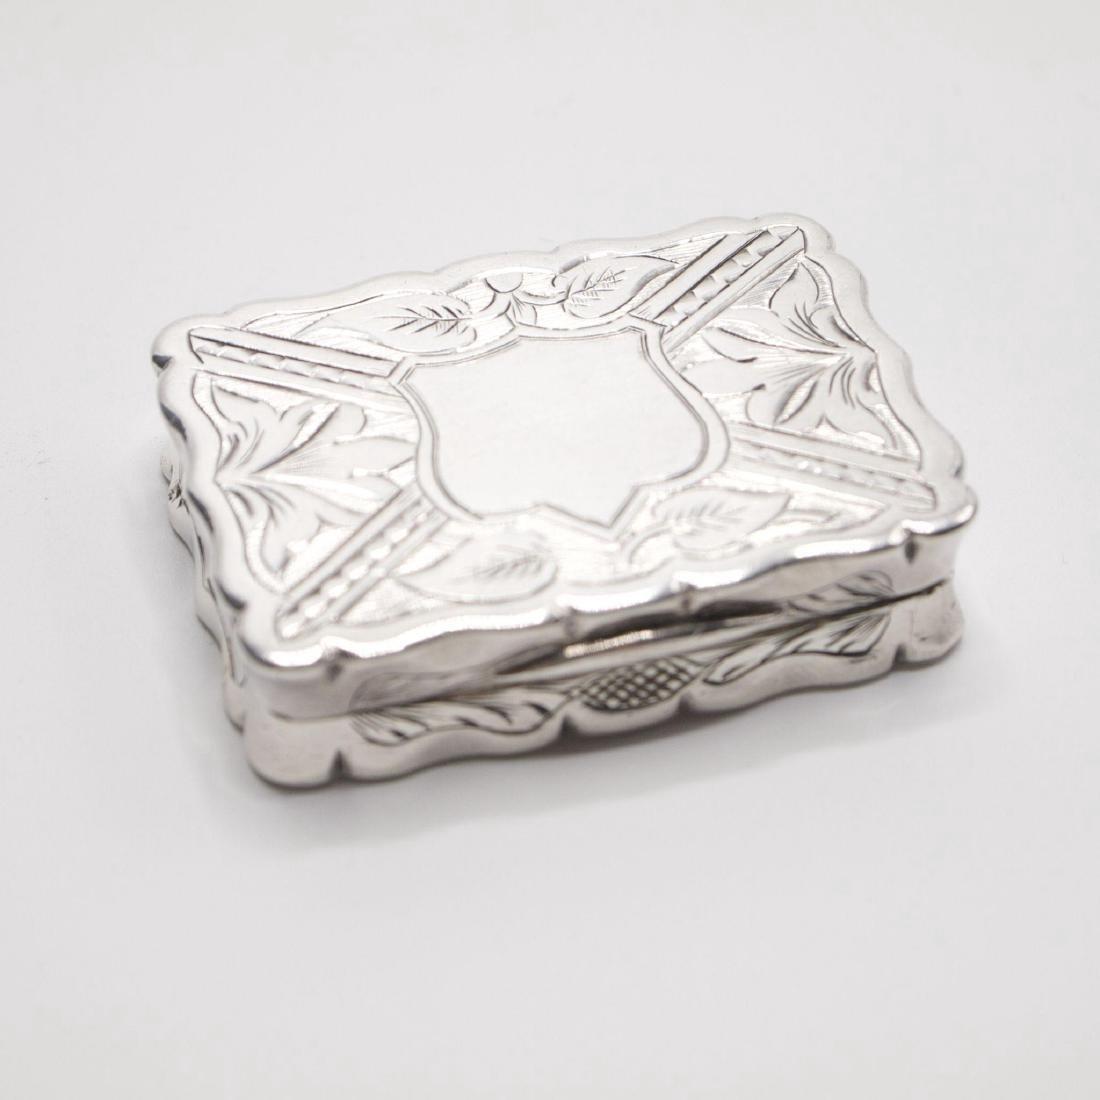 Antique Victorian Sterling Silver Vinaigrette, 1875 - 7